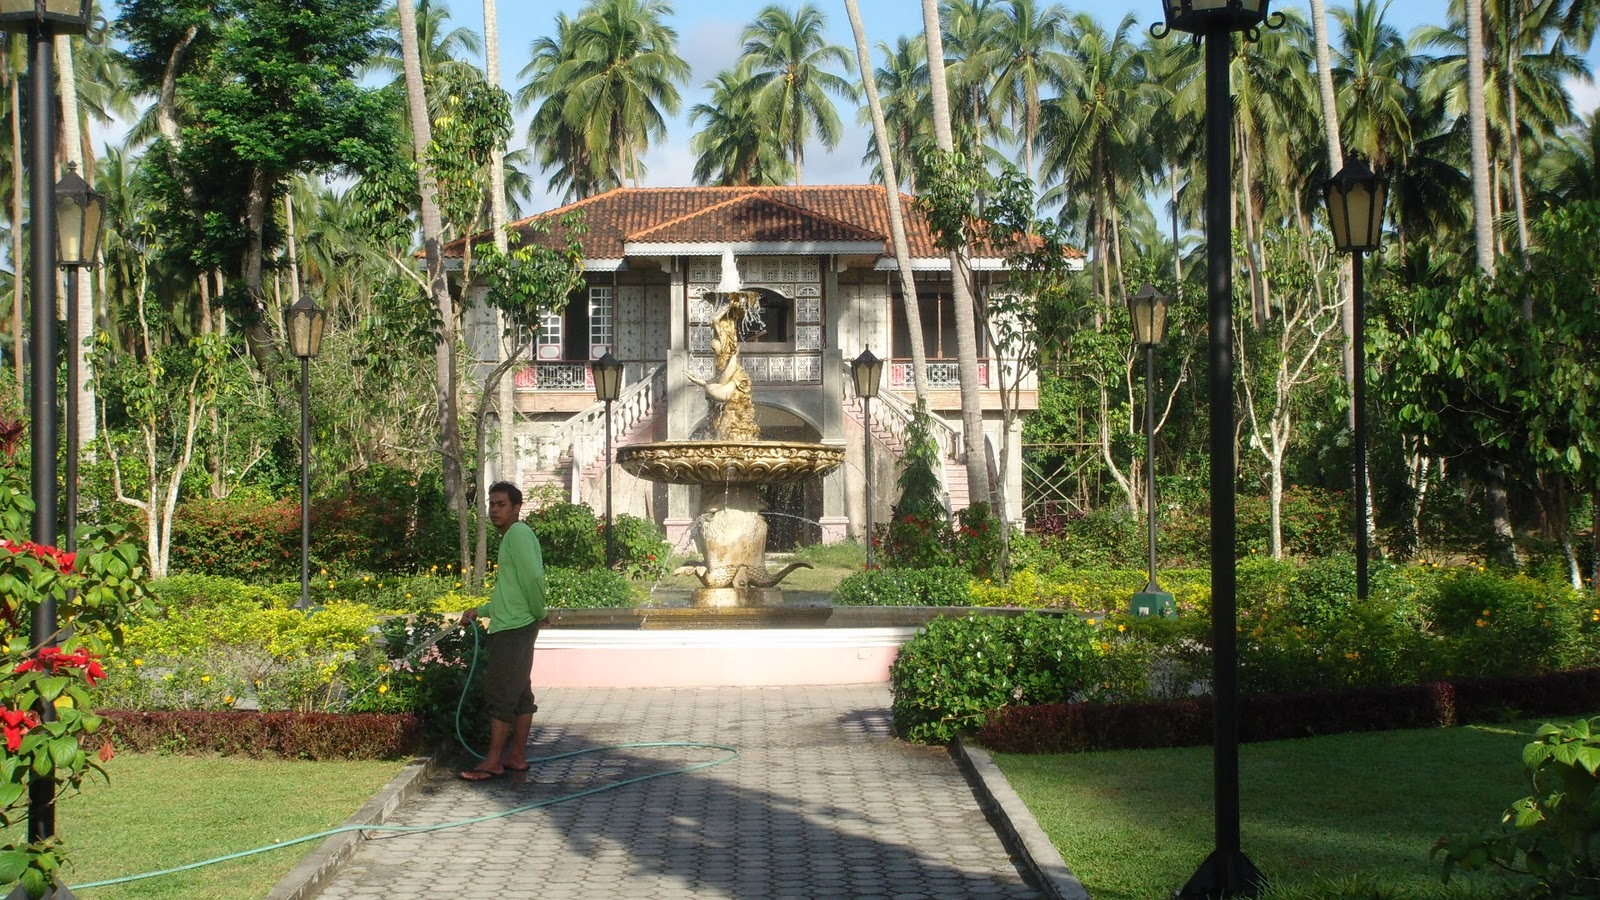 Trip Ko 39 To Villa Escudero Remarkable Experience Of True